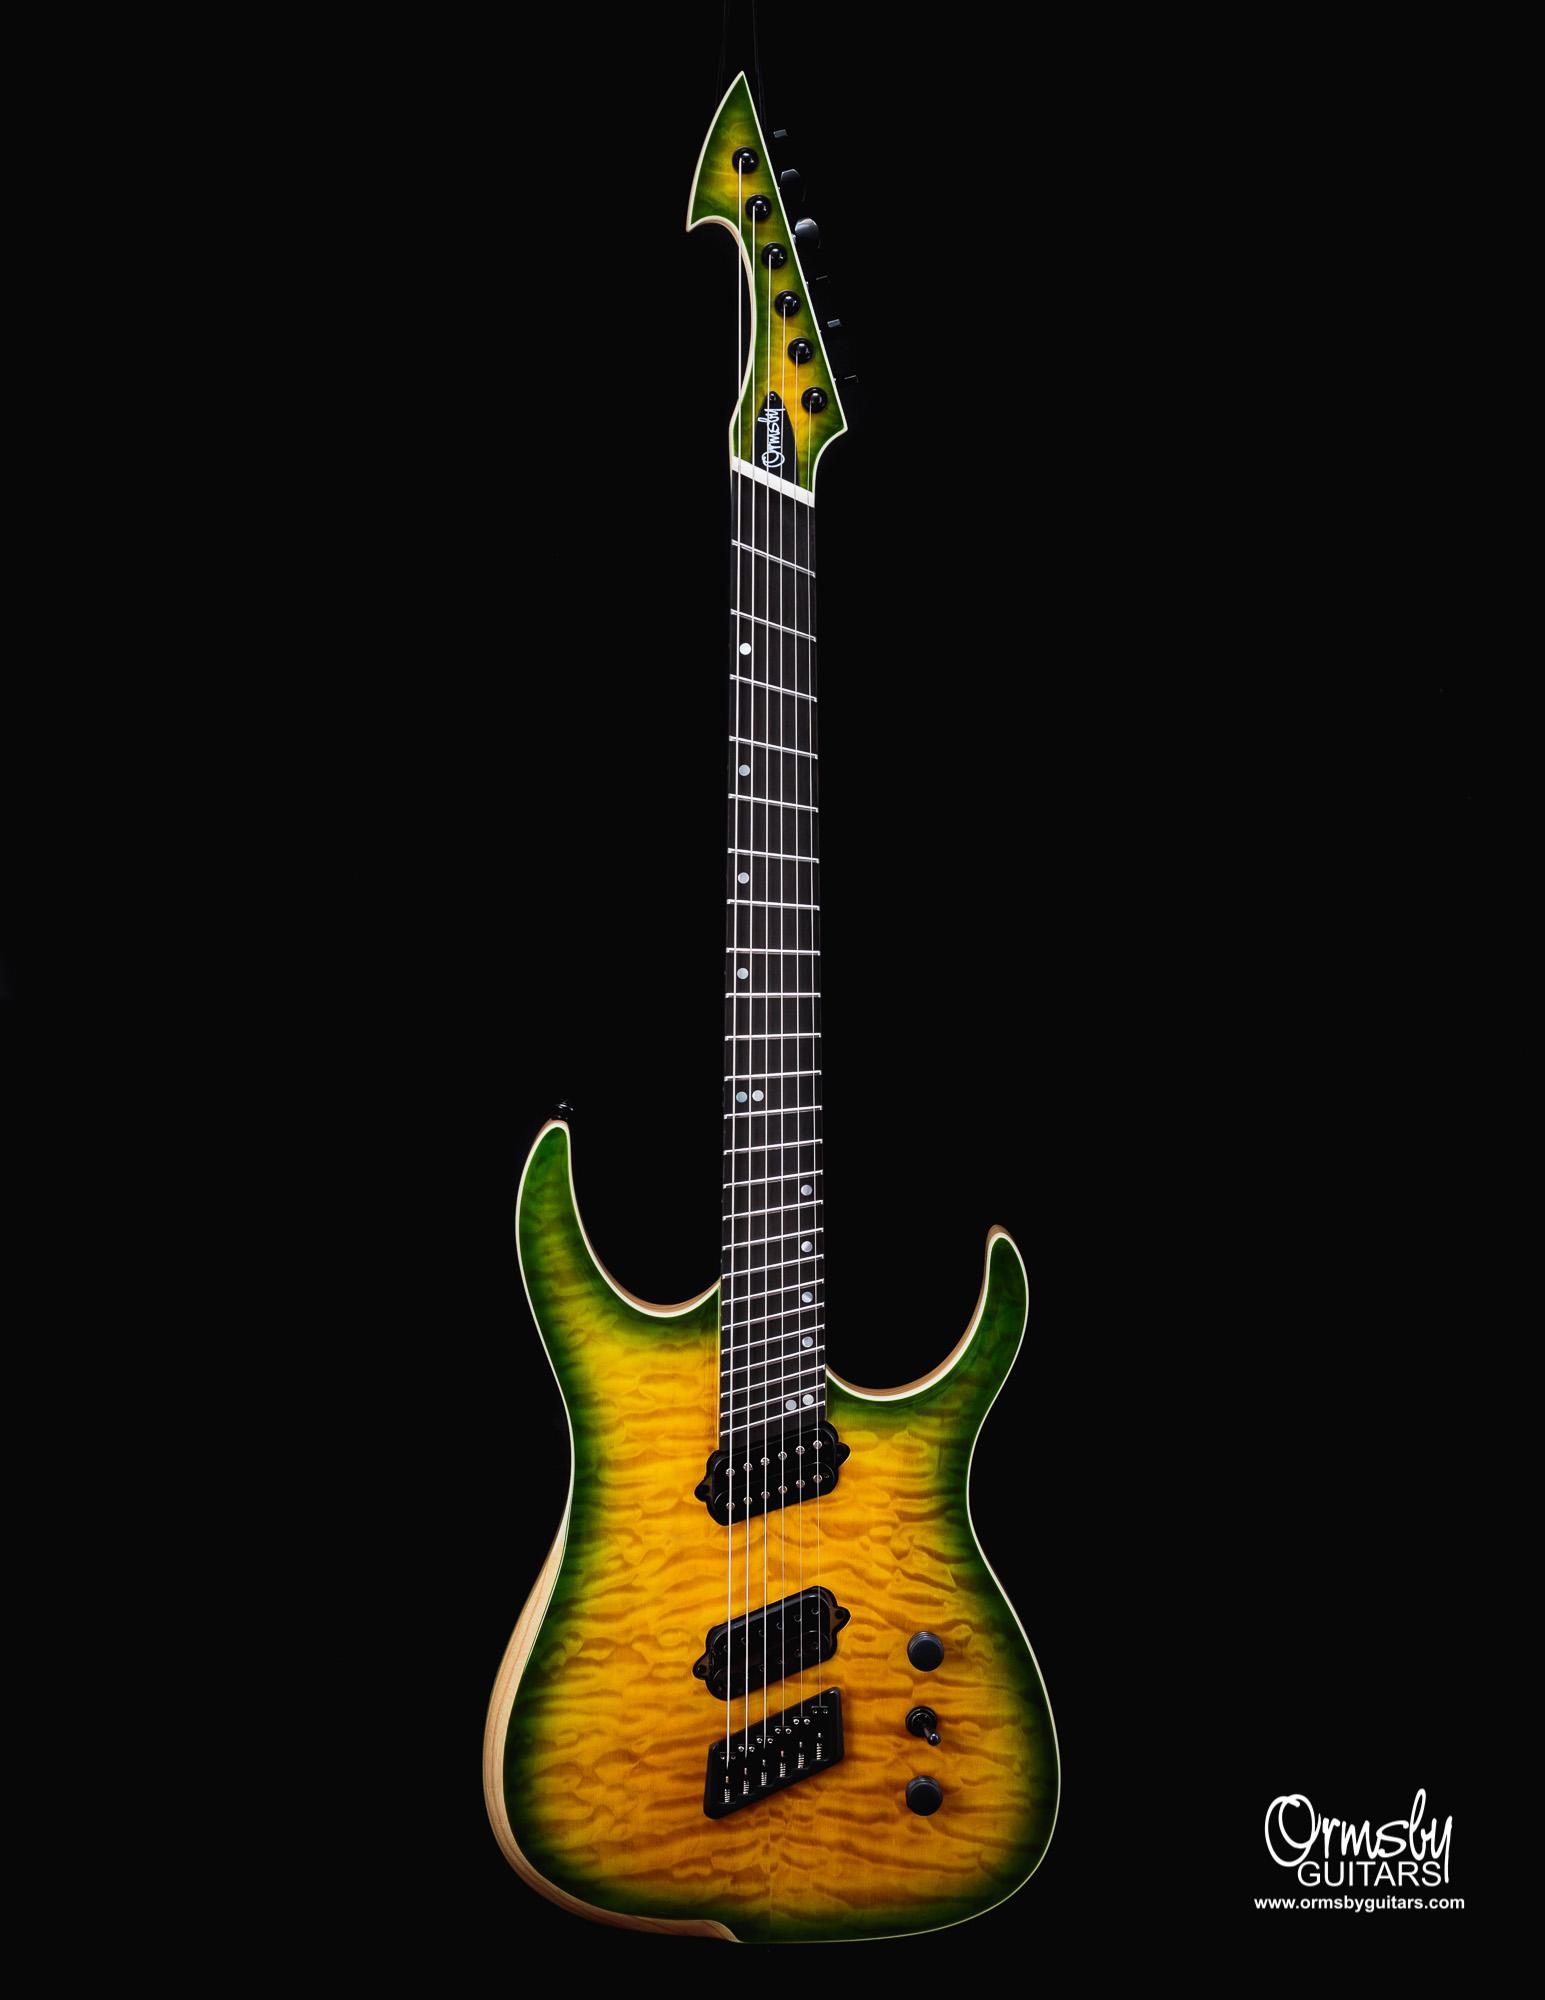 Ormsby Guitars Run 11 Hype